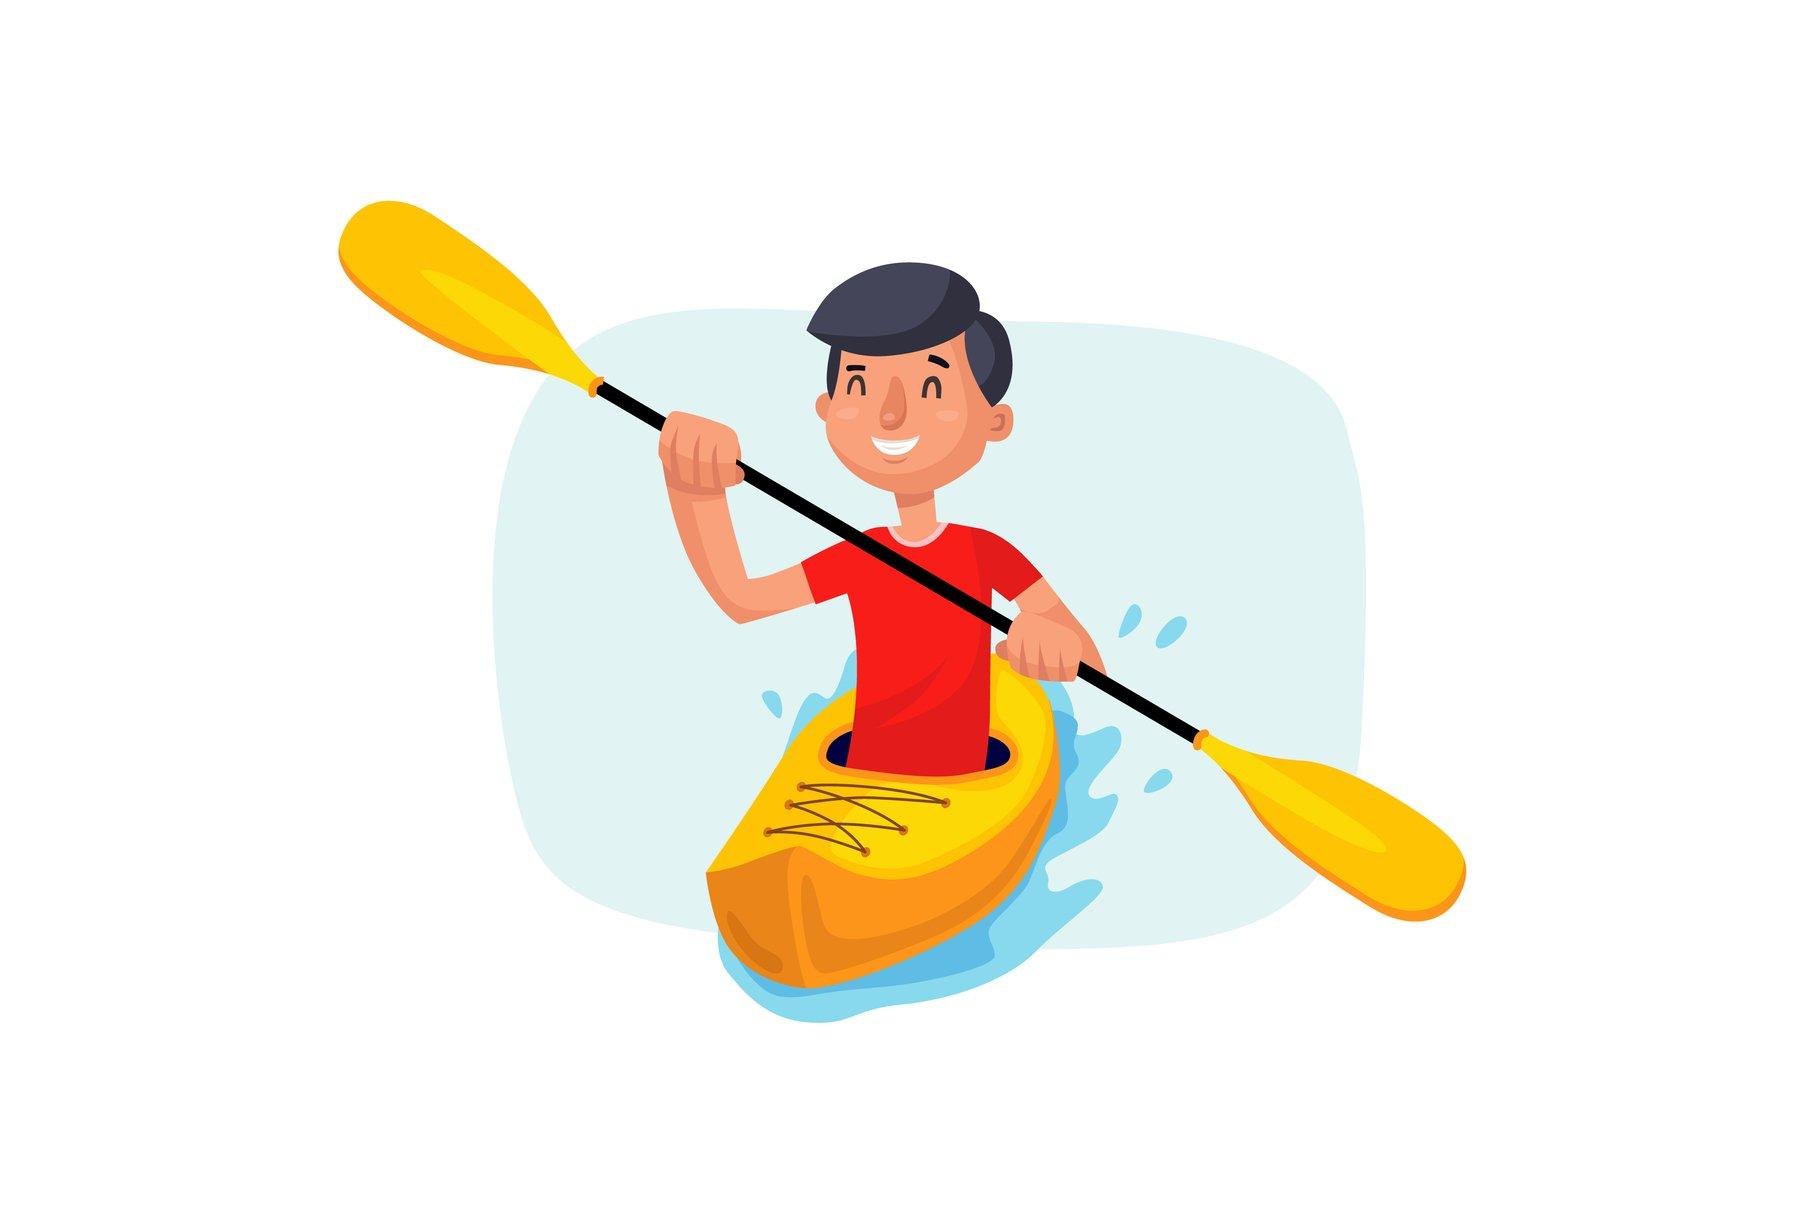 Kayaking Paddling on Boats Vector. Having Fun. Paddle Oar. example image 1